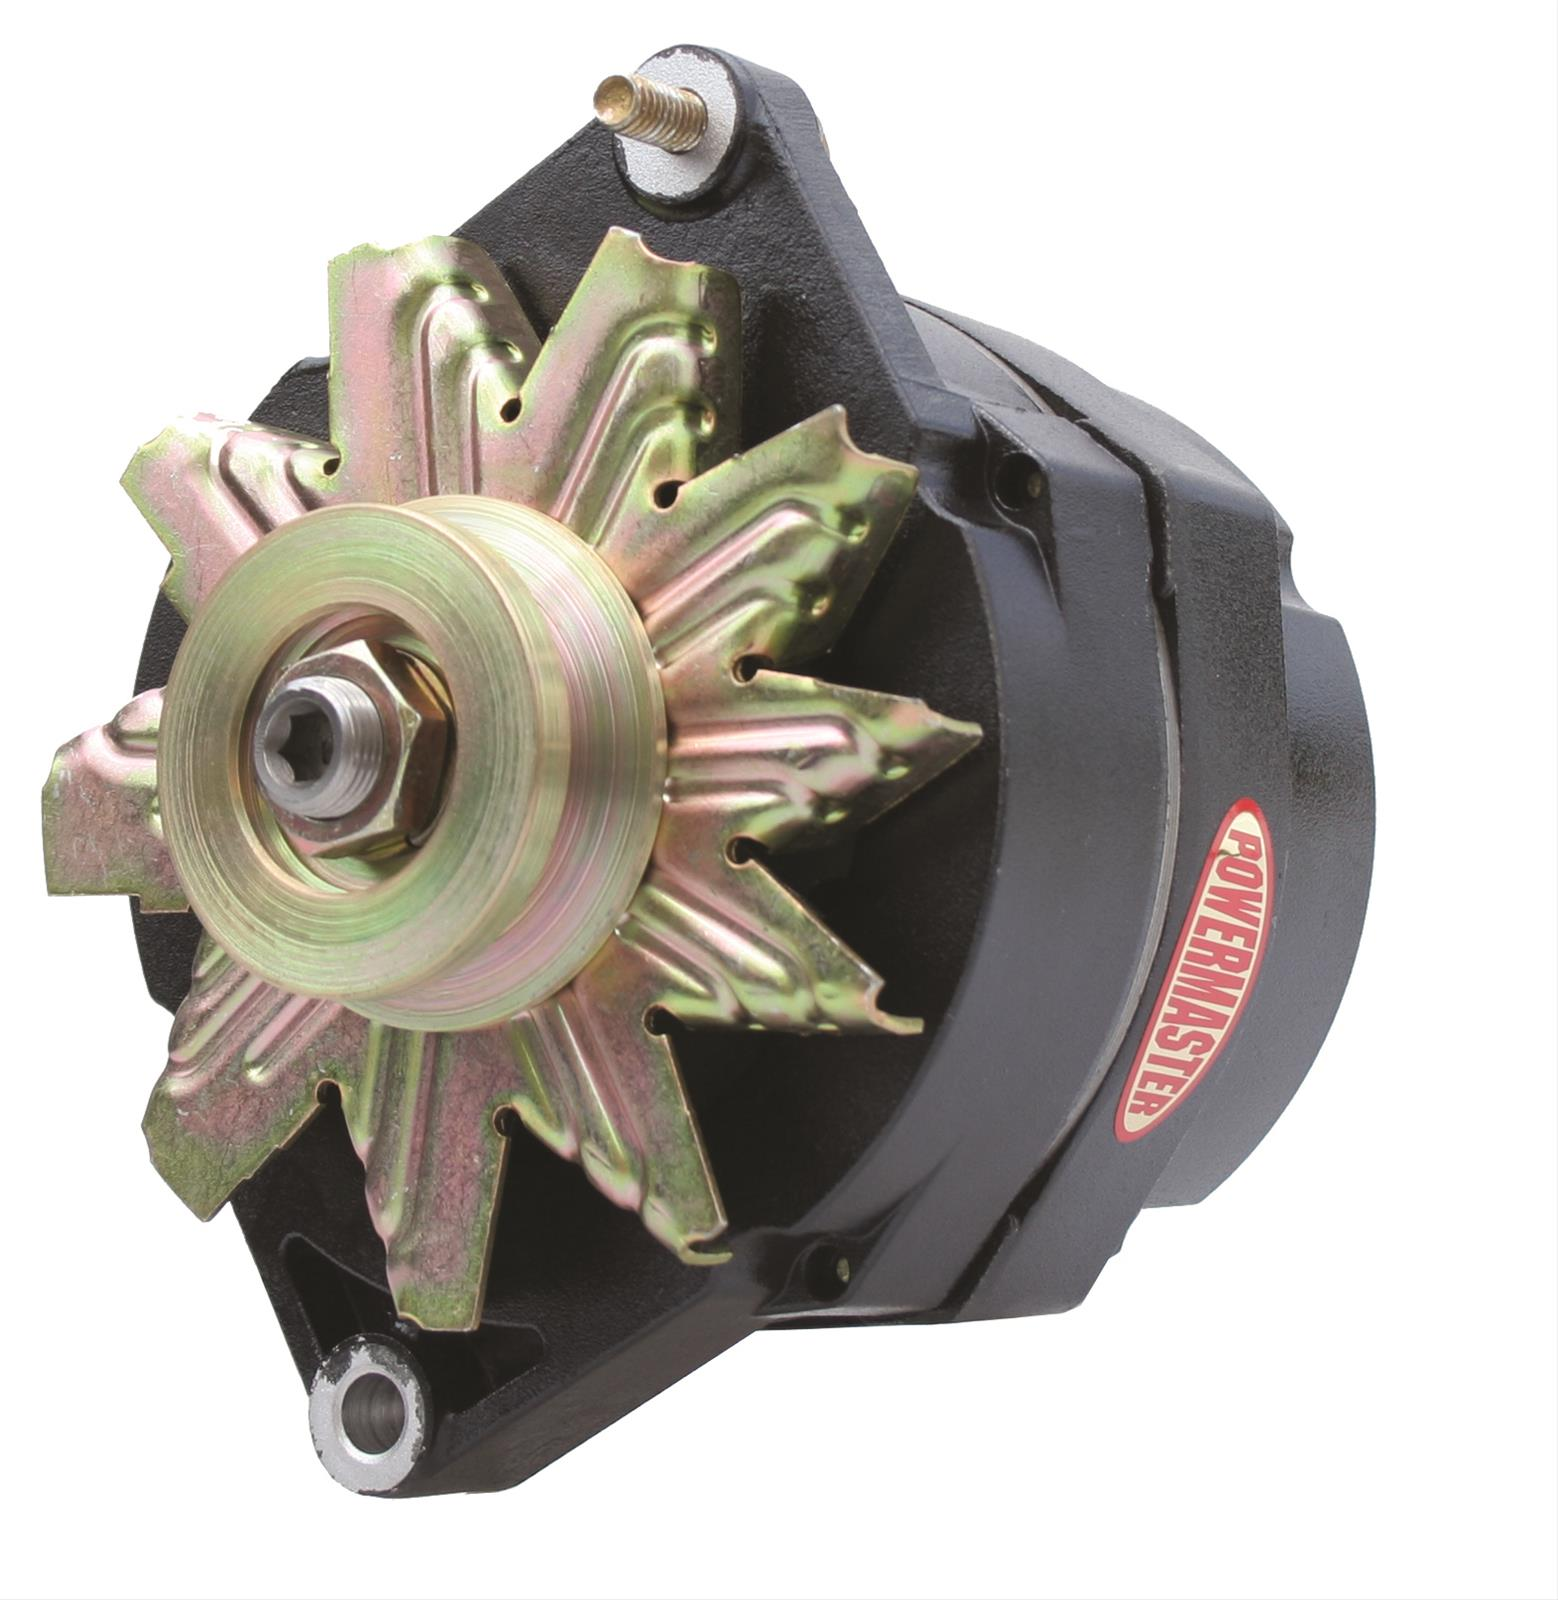 Powermaster Street Alternators 57293 - Free Shipping on Orders Over $99 at  Summit Racing